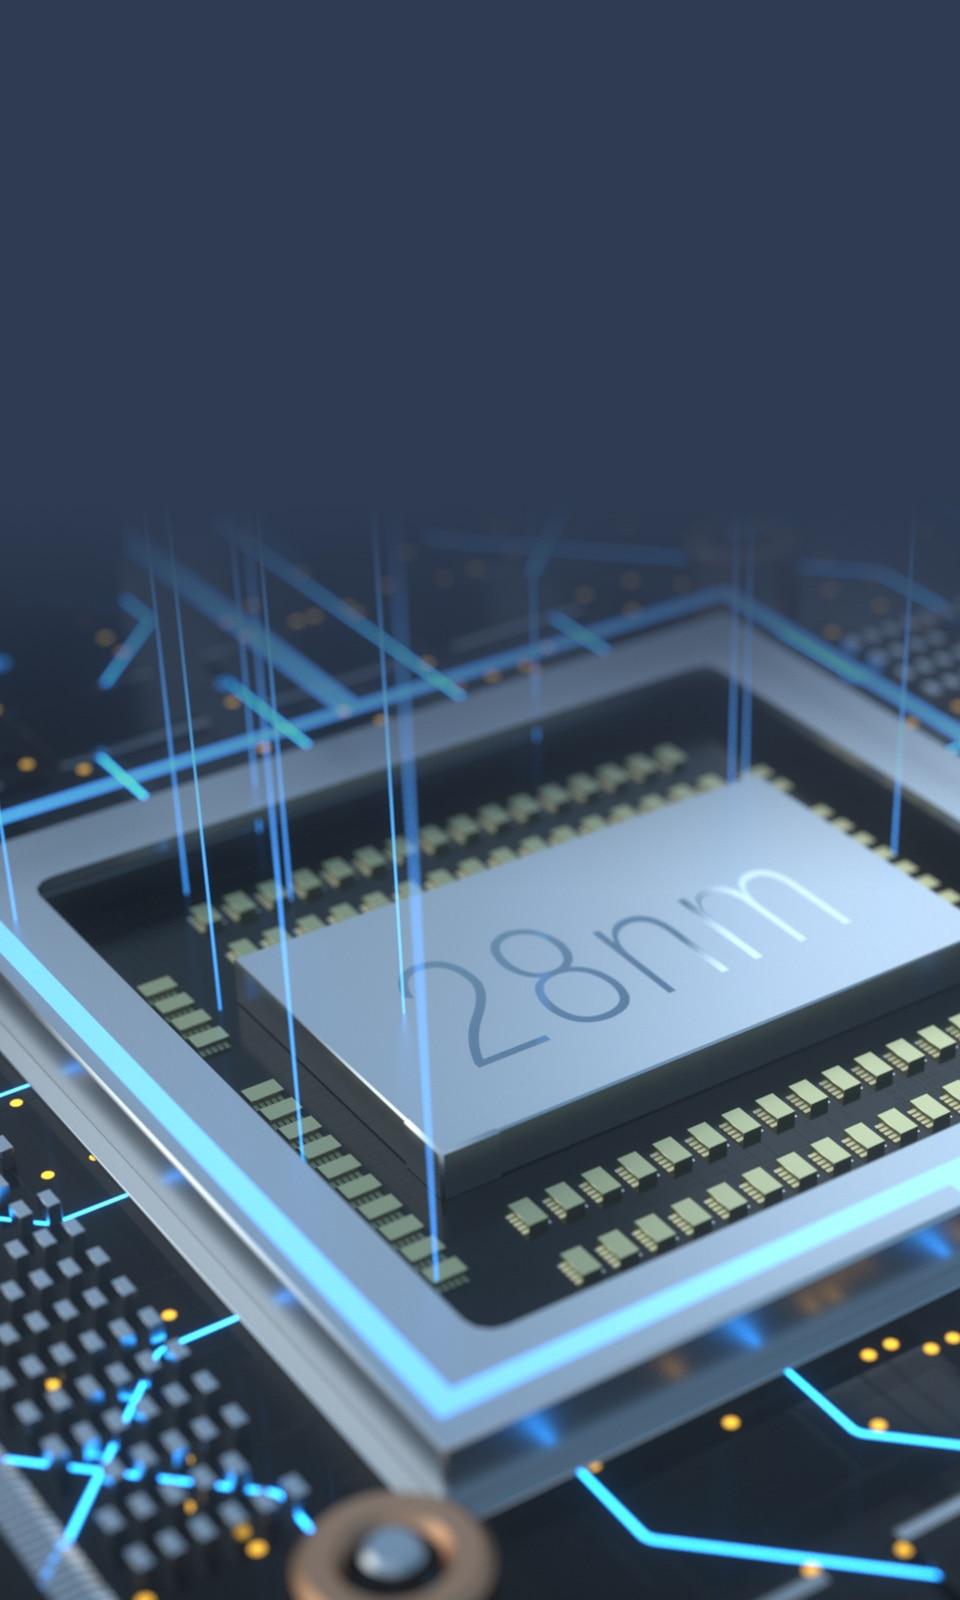 Unlocked HUAWEI Wifi WS5200 AC1200 Gigabit Wireless Router Dual Band WiFi  5GHz Preferred Pro Suport 5G IPv6